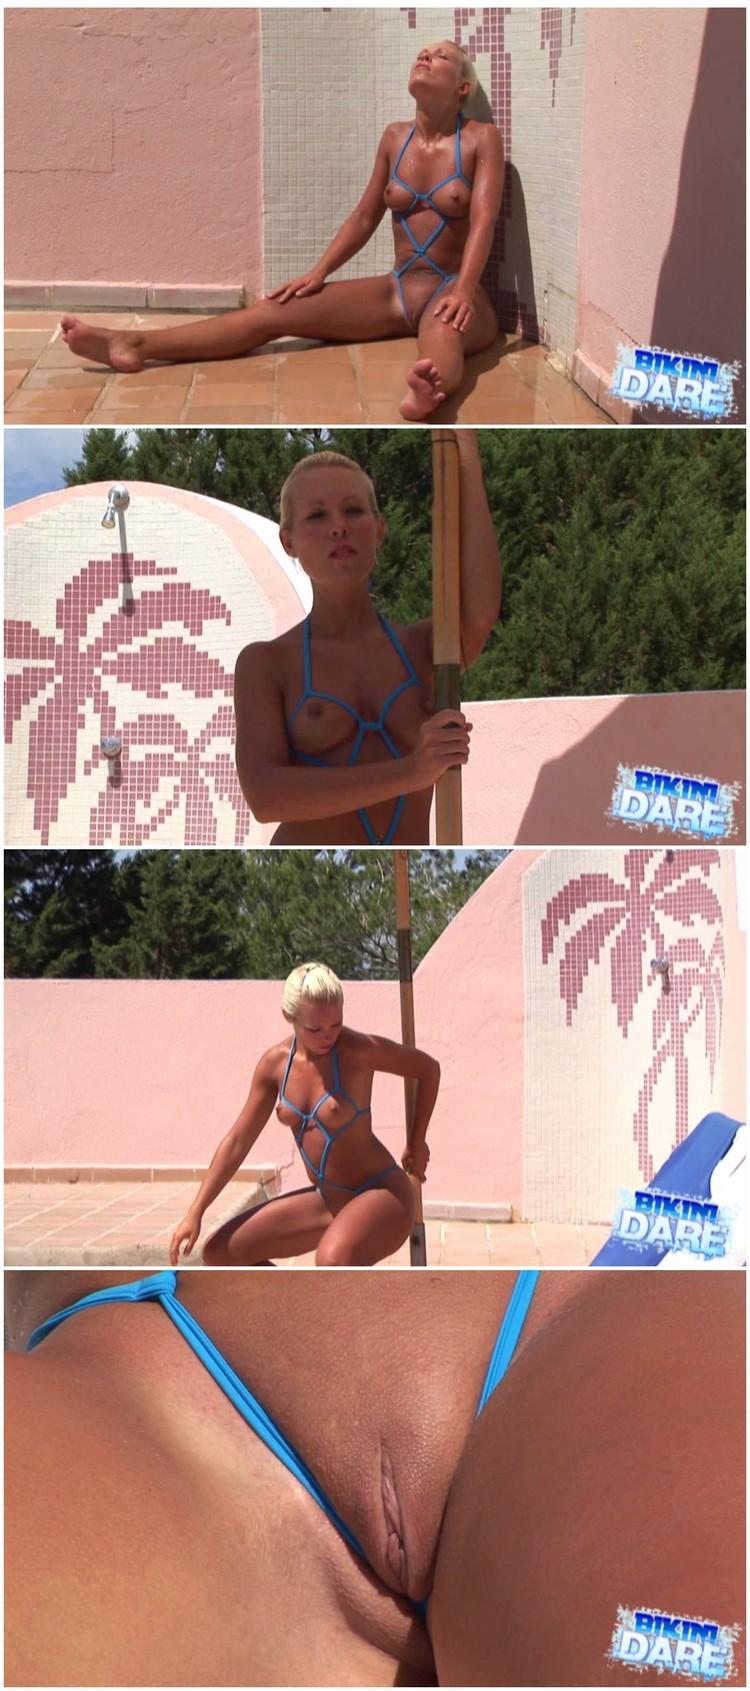 bikini-dare119_cover_l.jpg